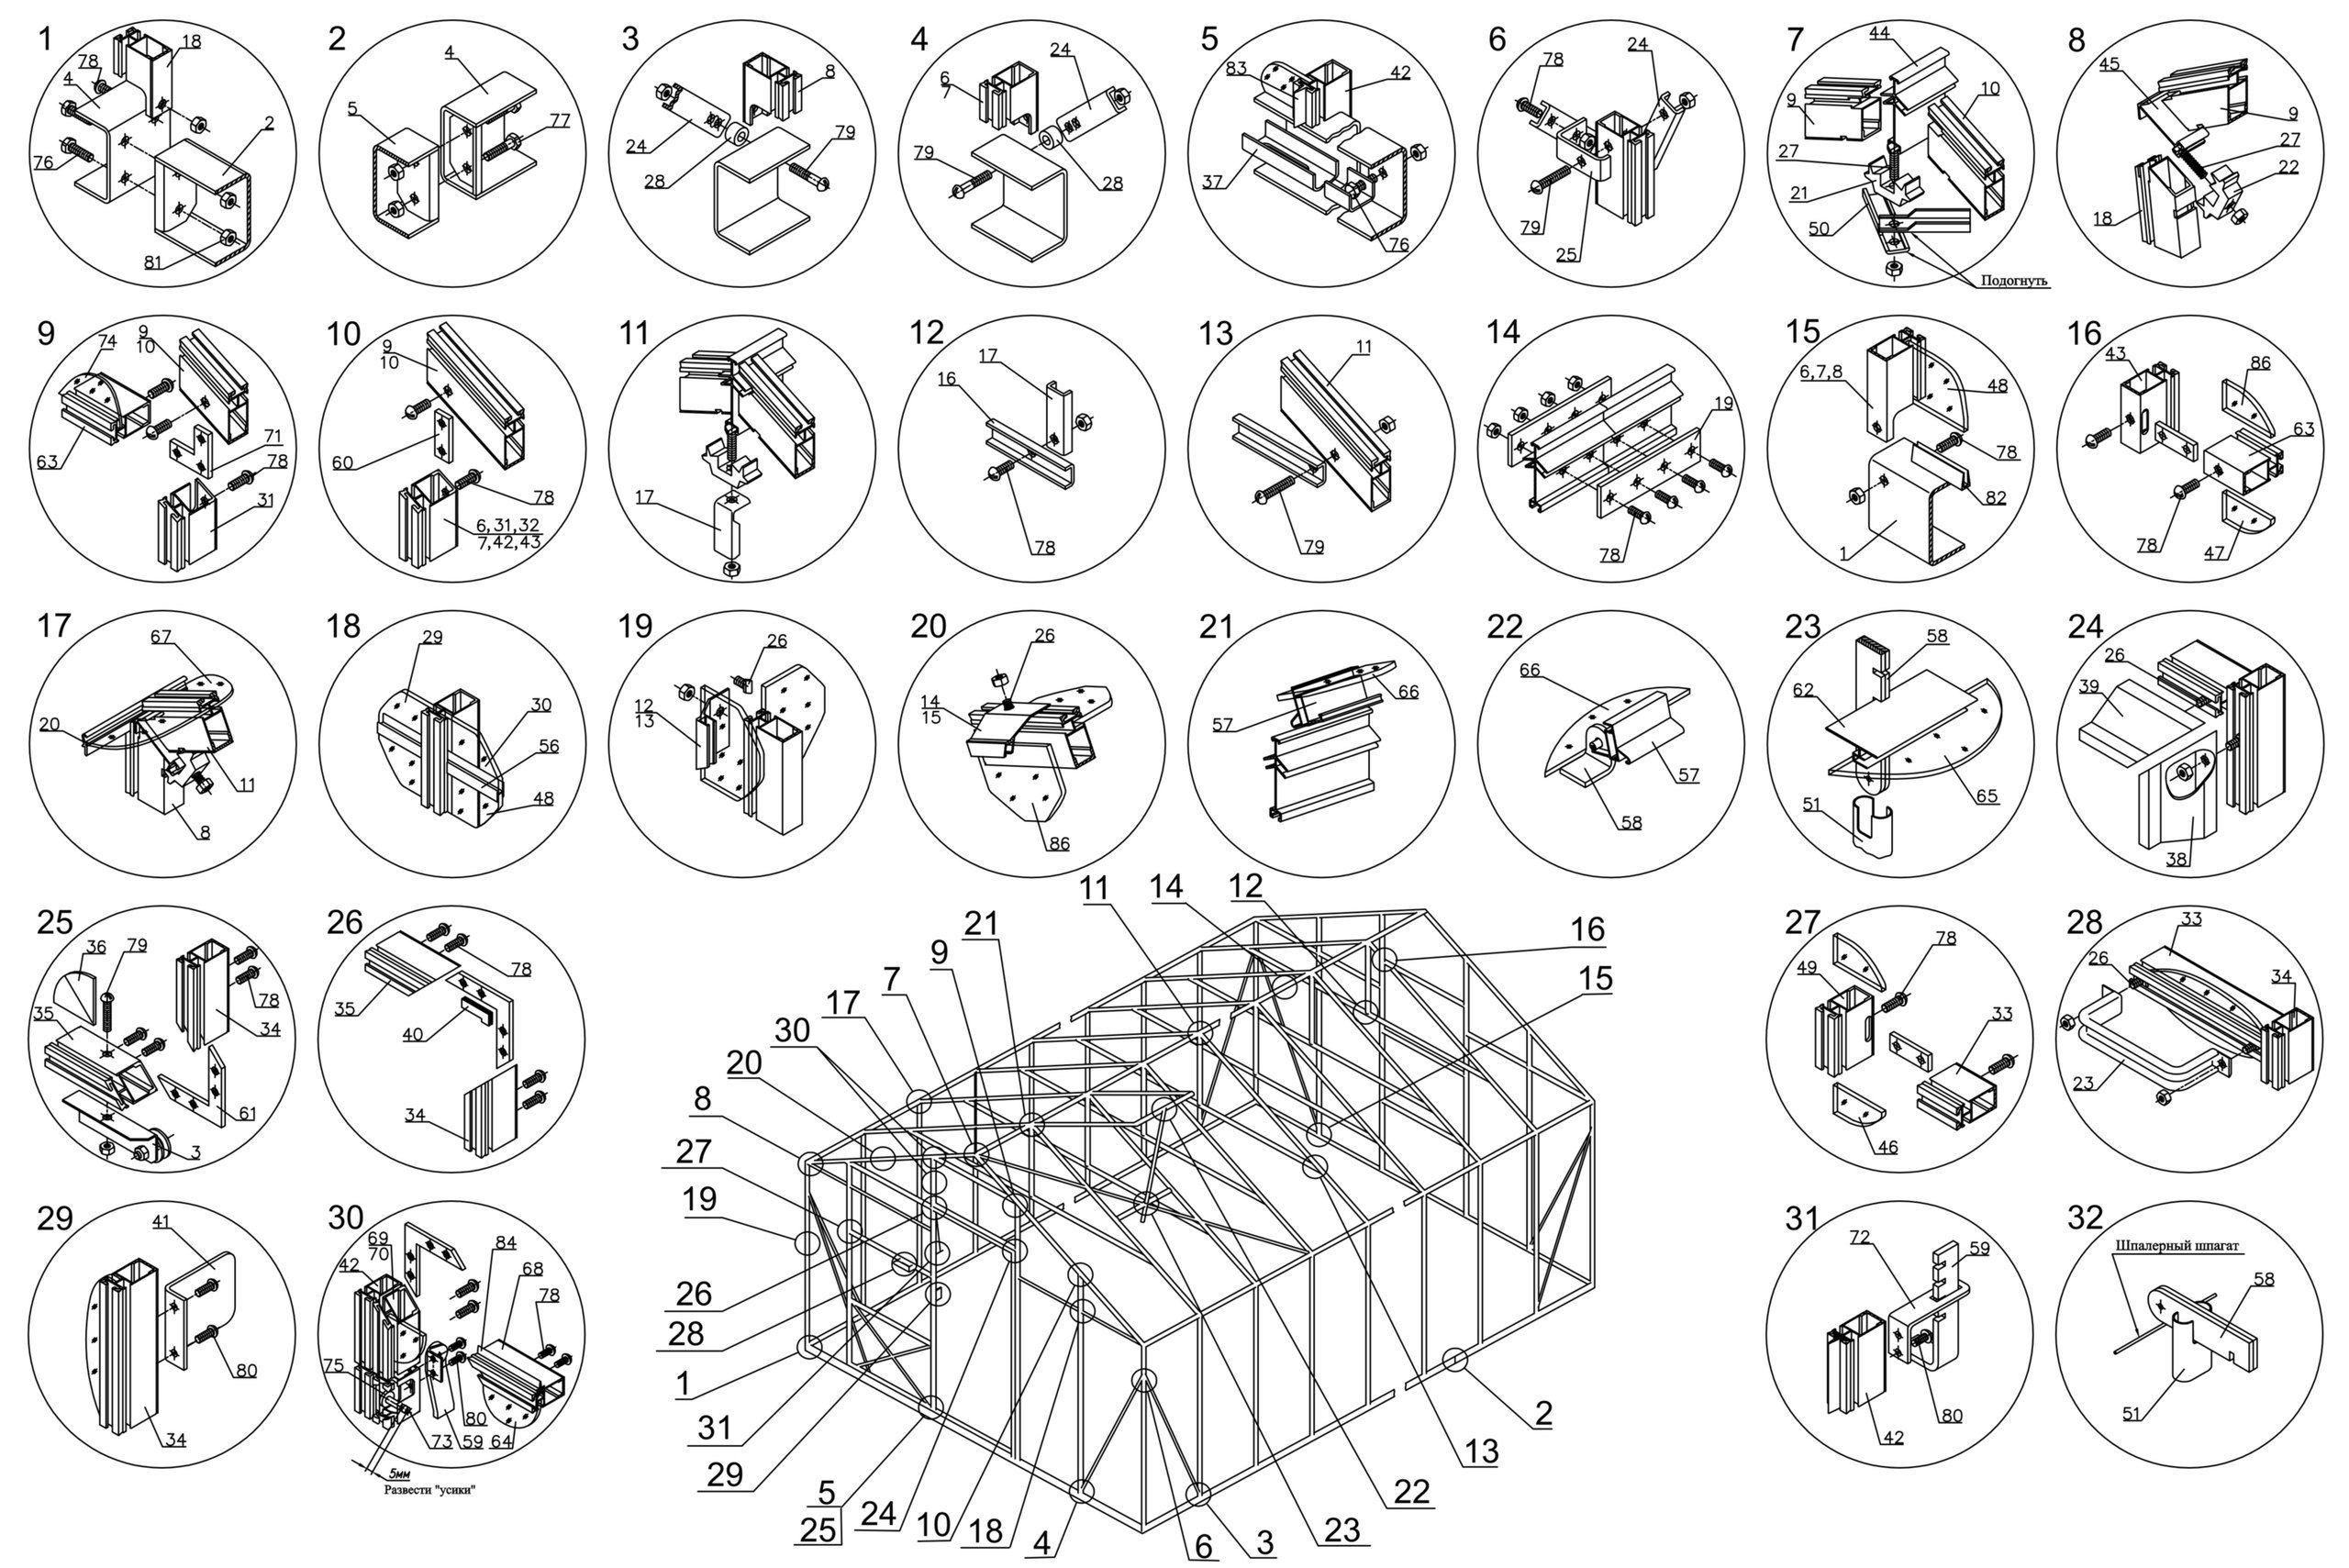 построить теплицу своими руками схема чертёж